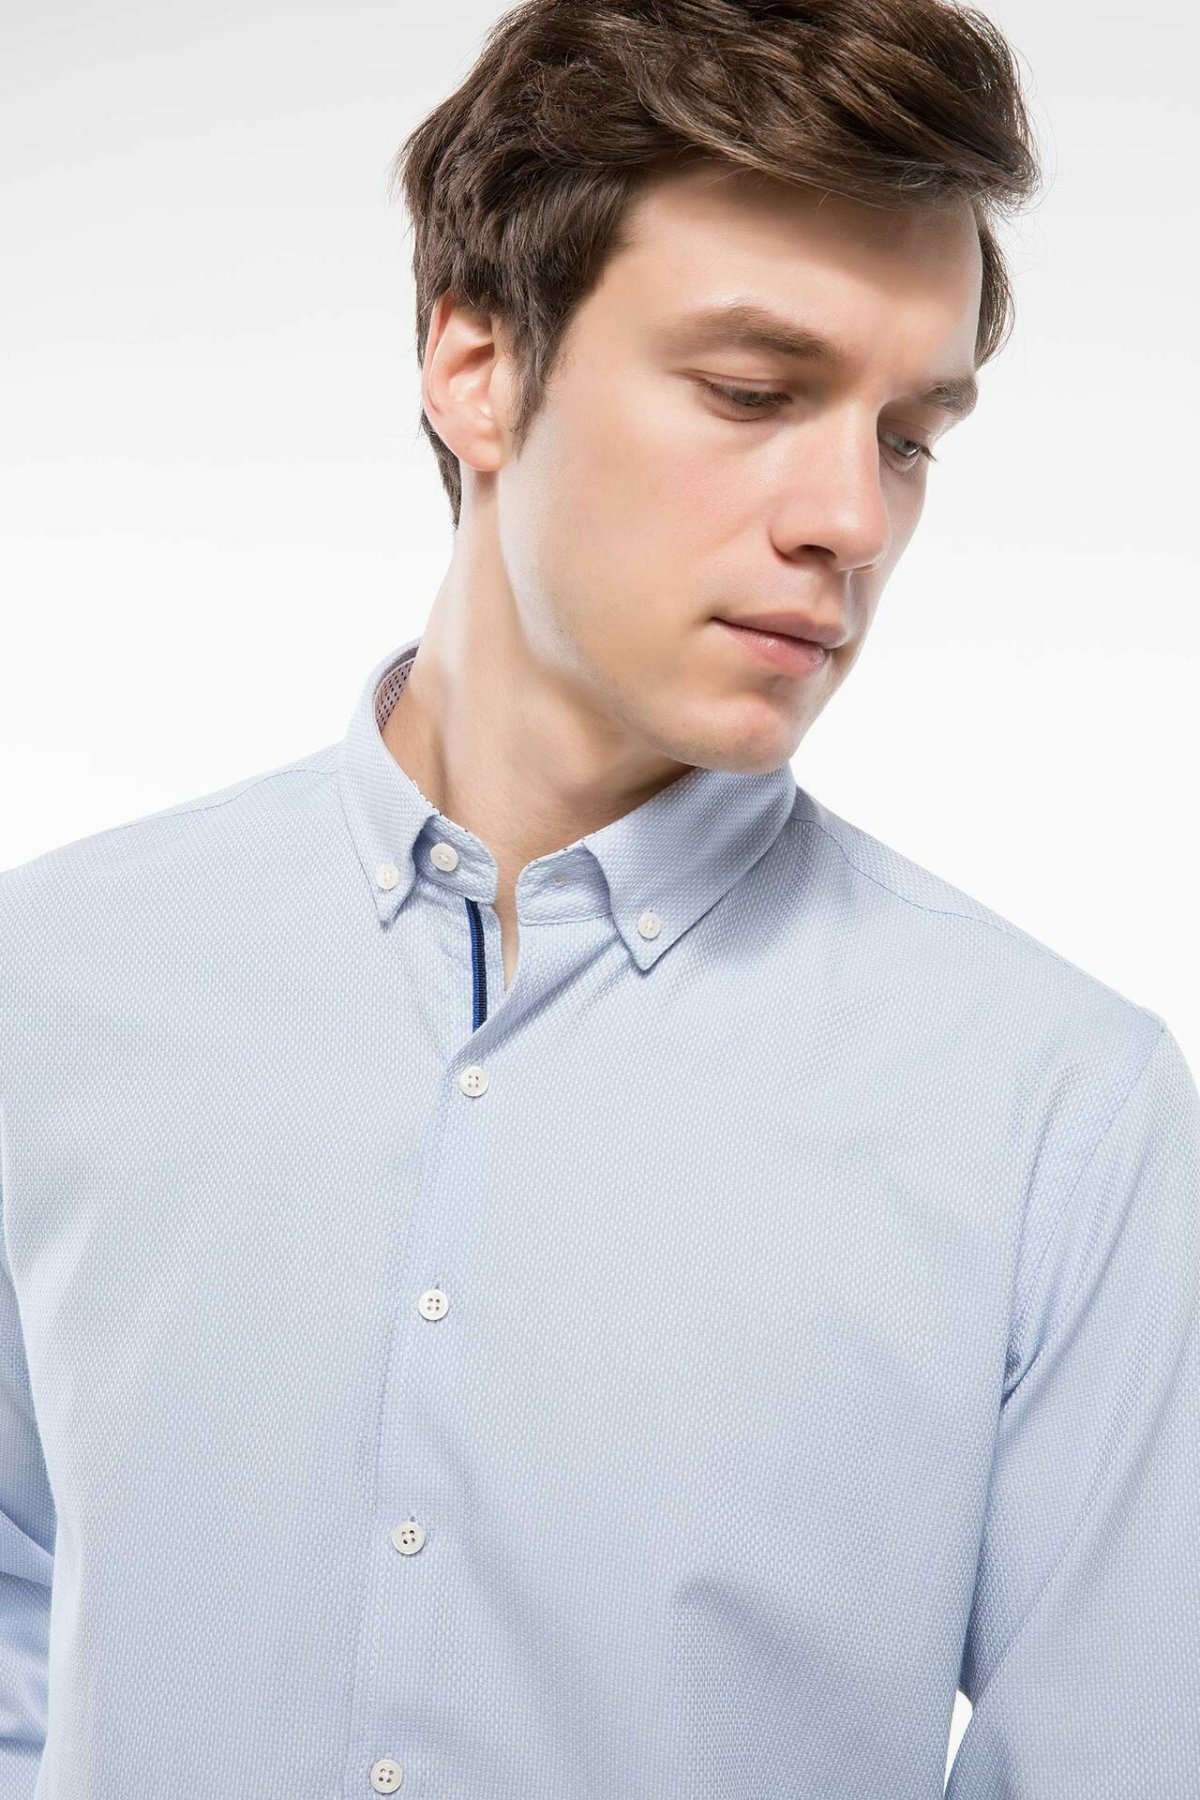 DeFacto Man Long Sleeve Shirt Lapel Collar Solid Business Formal Shirt Mens Simple Autumn New Tops - I1151AZ18AU